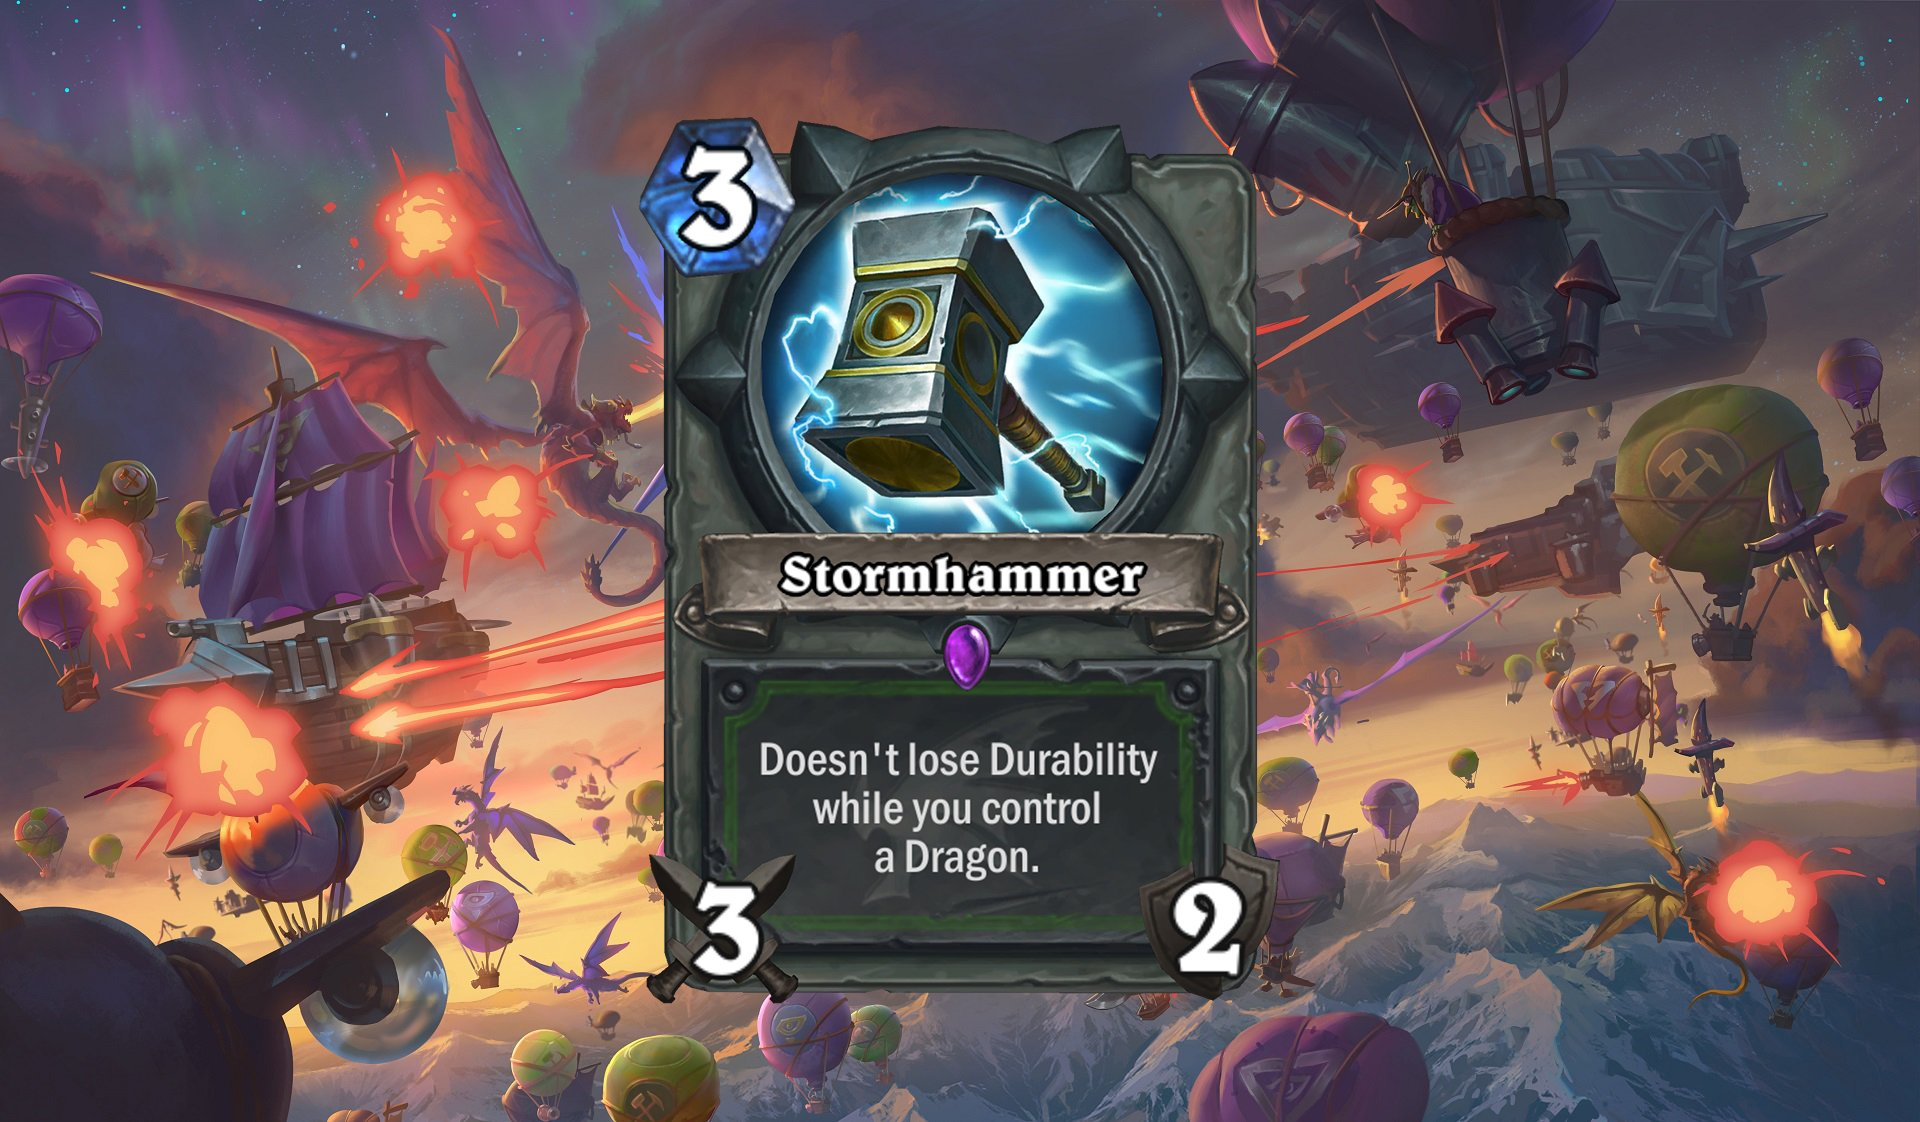 Hearthstone - Stormhammer